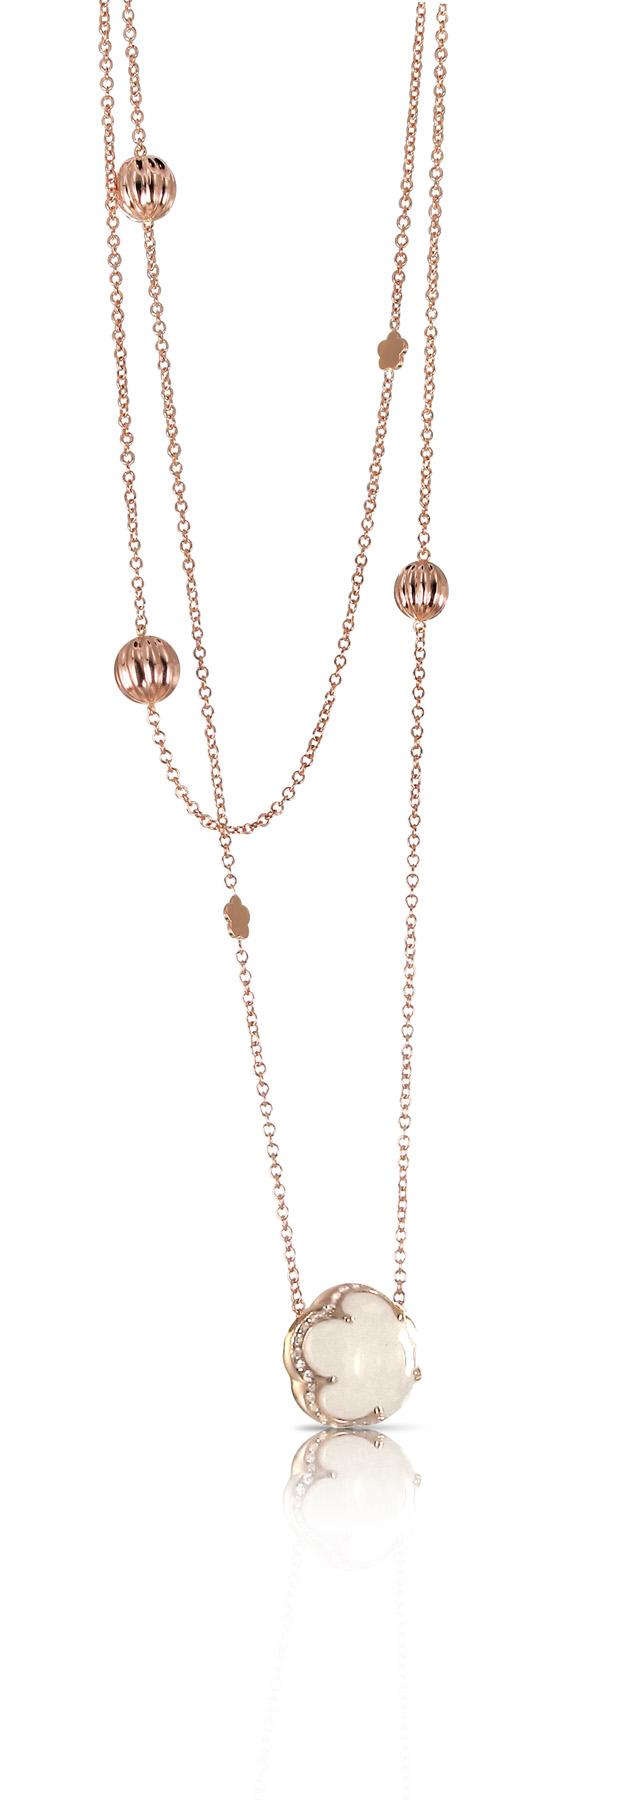 Bon Ton_necklace_14500R - Copy.jpg